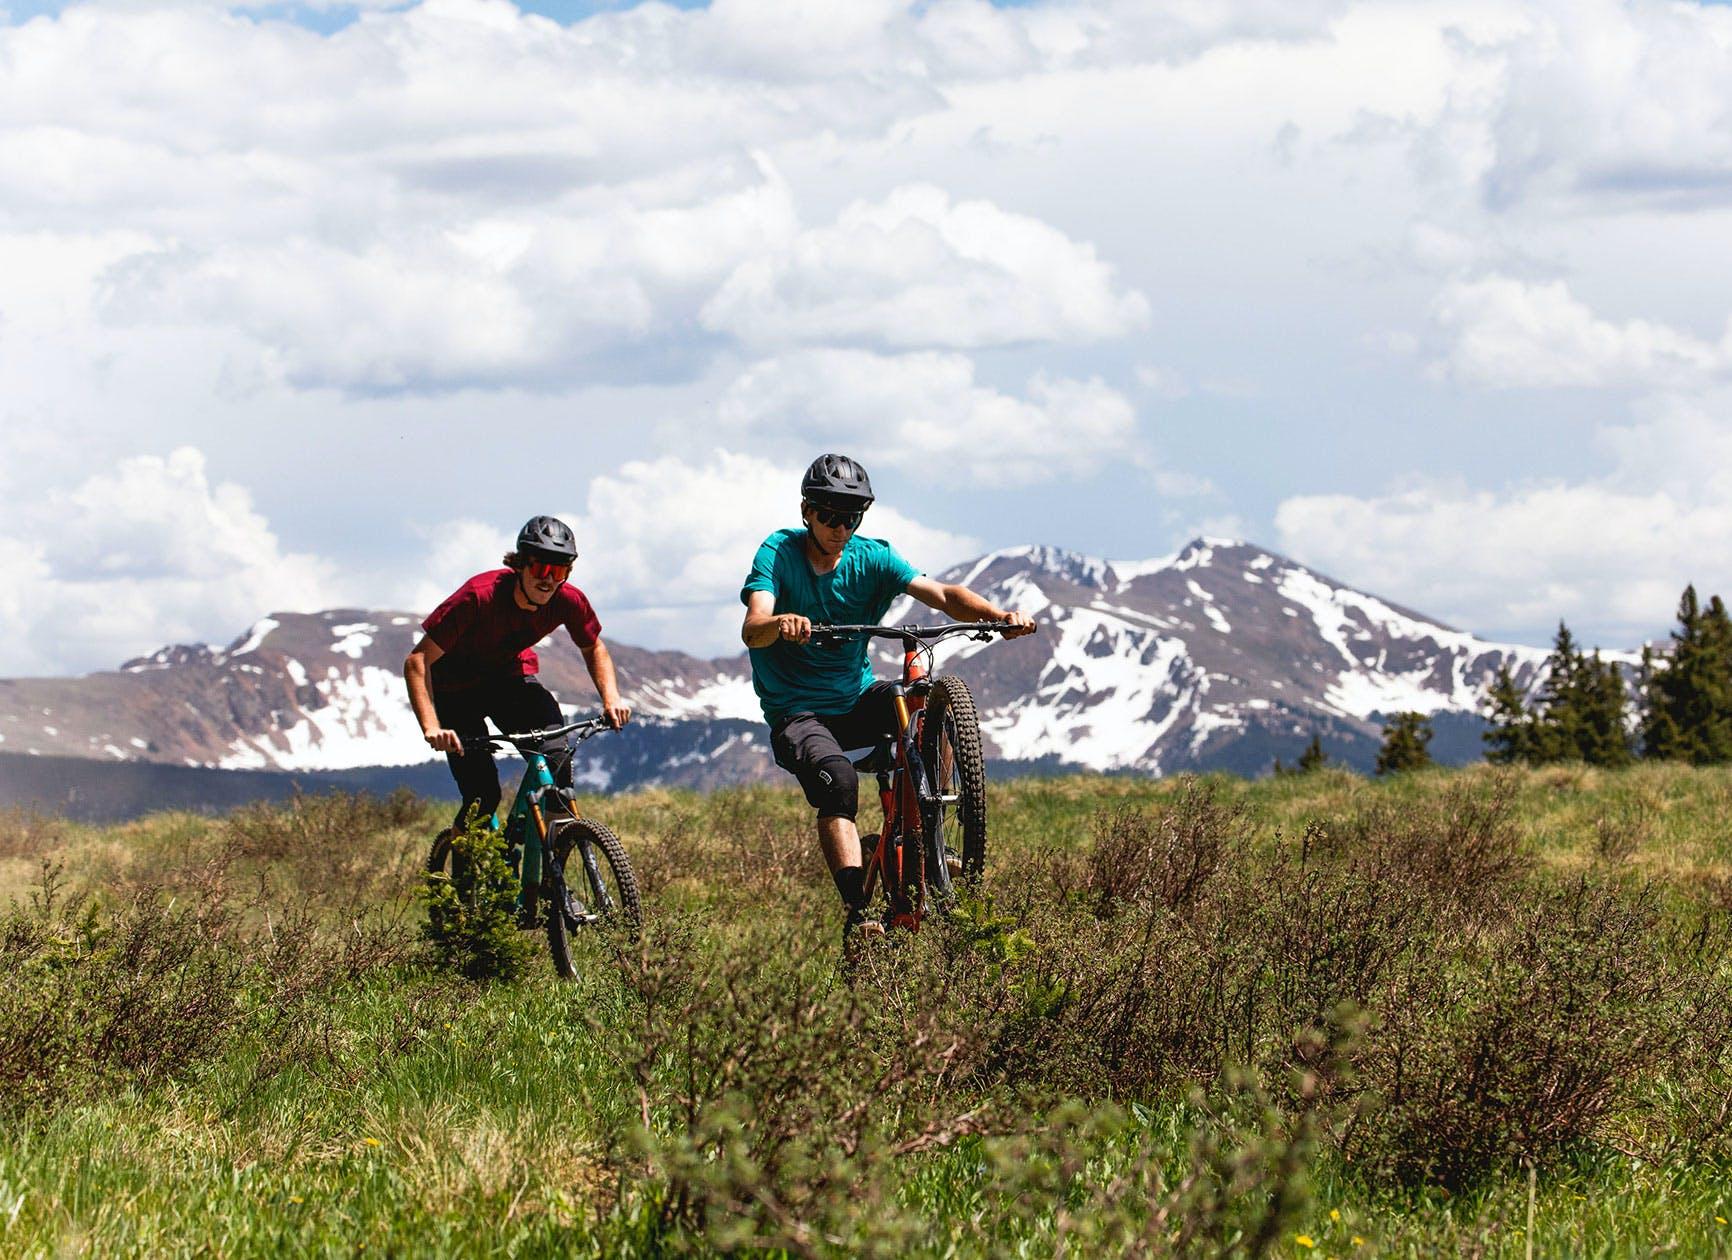 Yeti SB140 full review trail bike